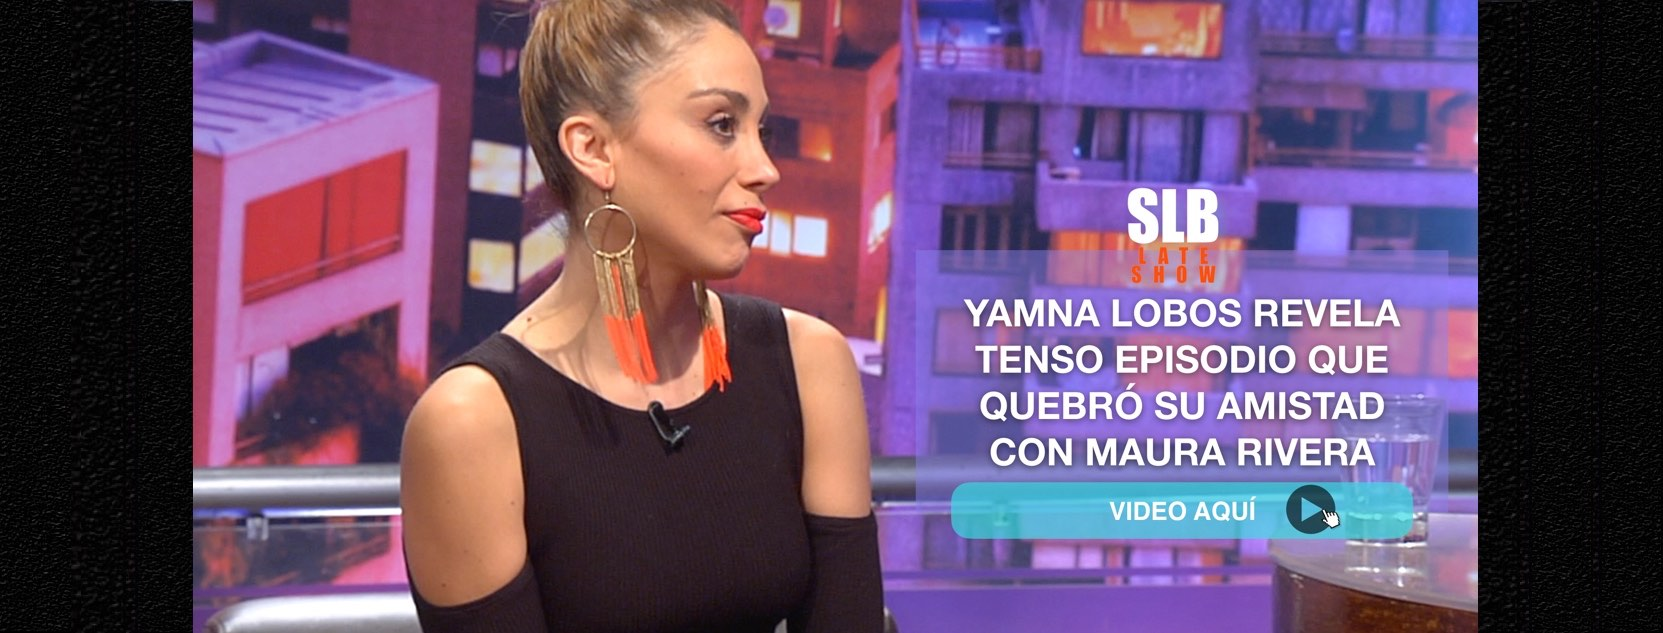 yamna-lobos-